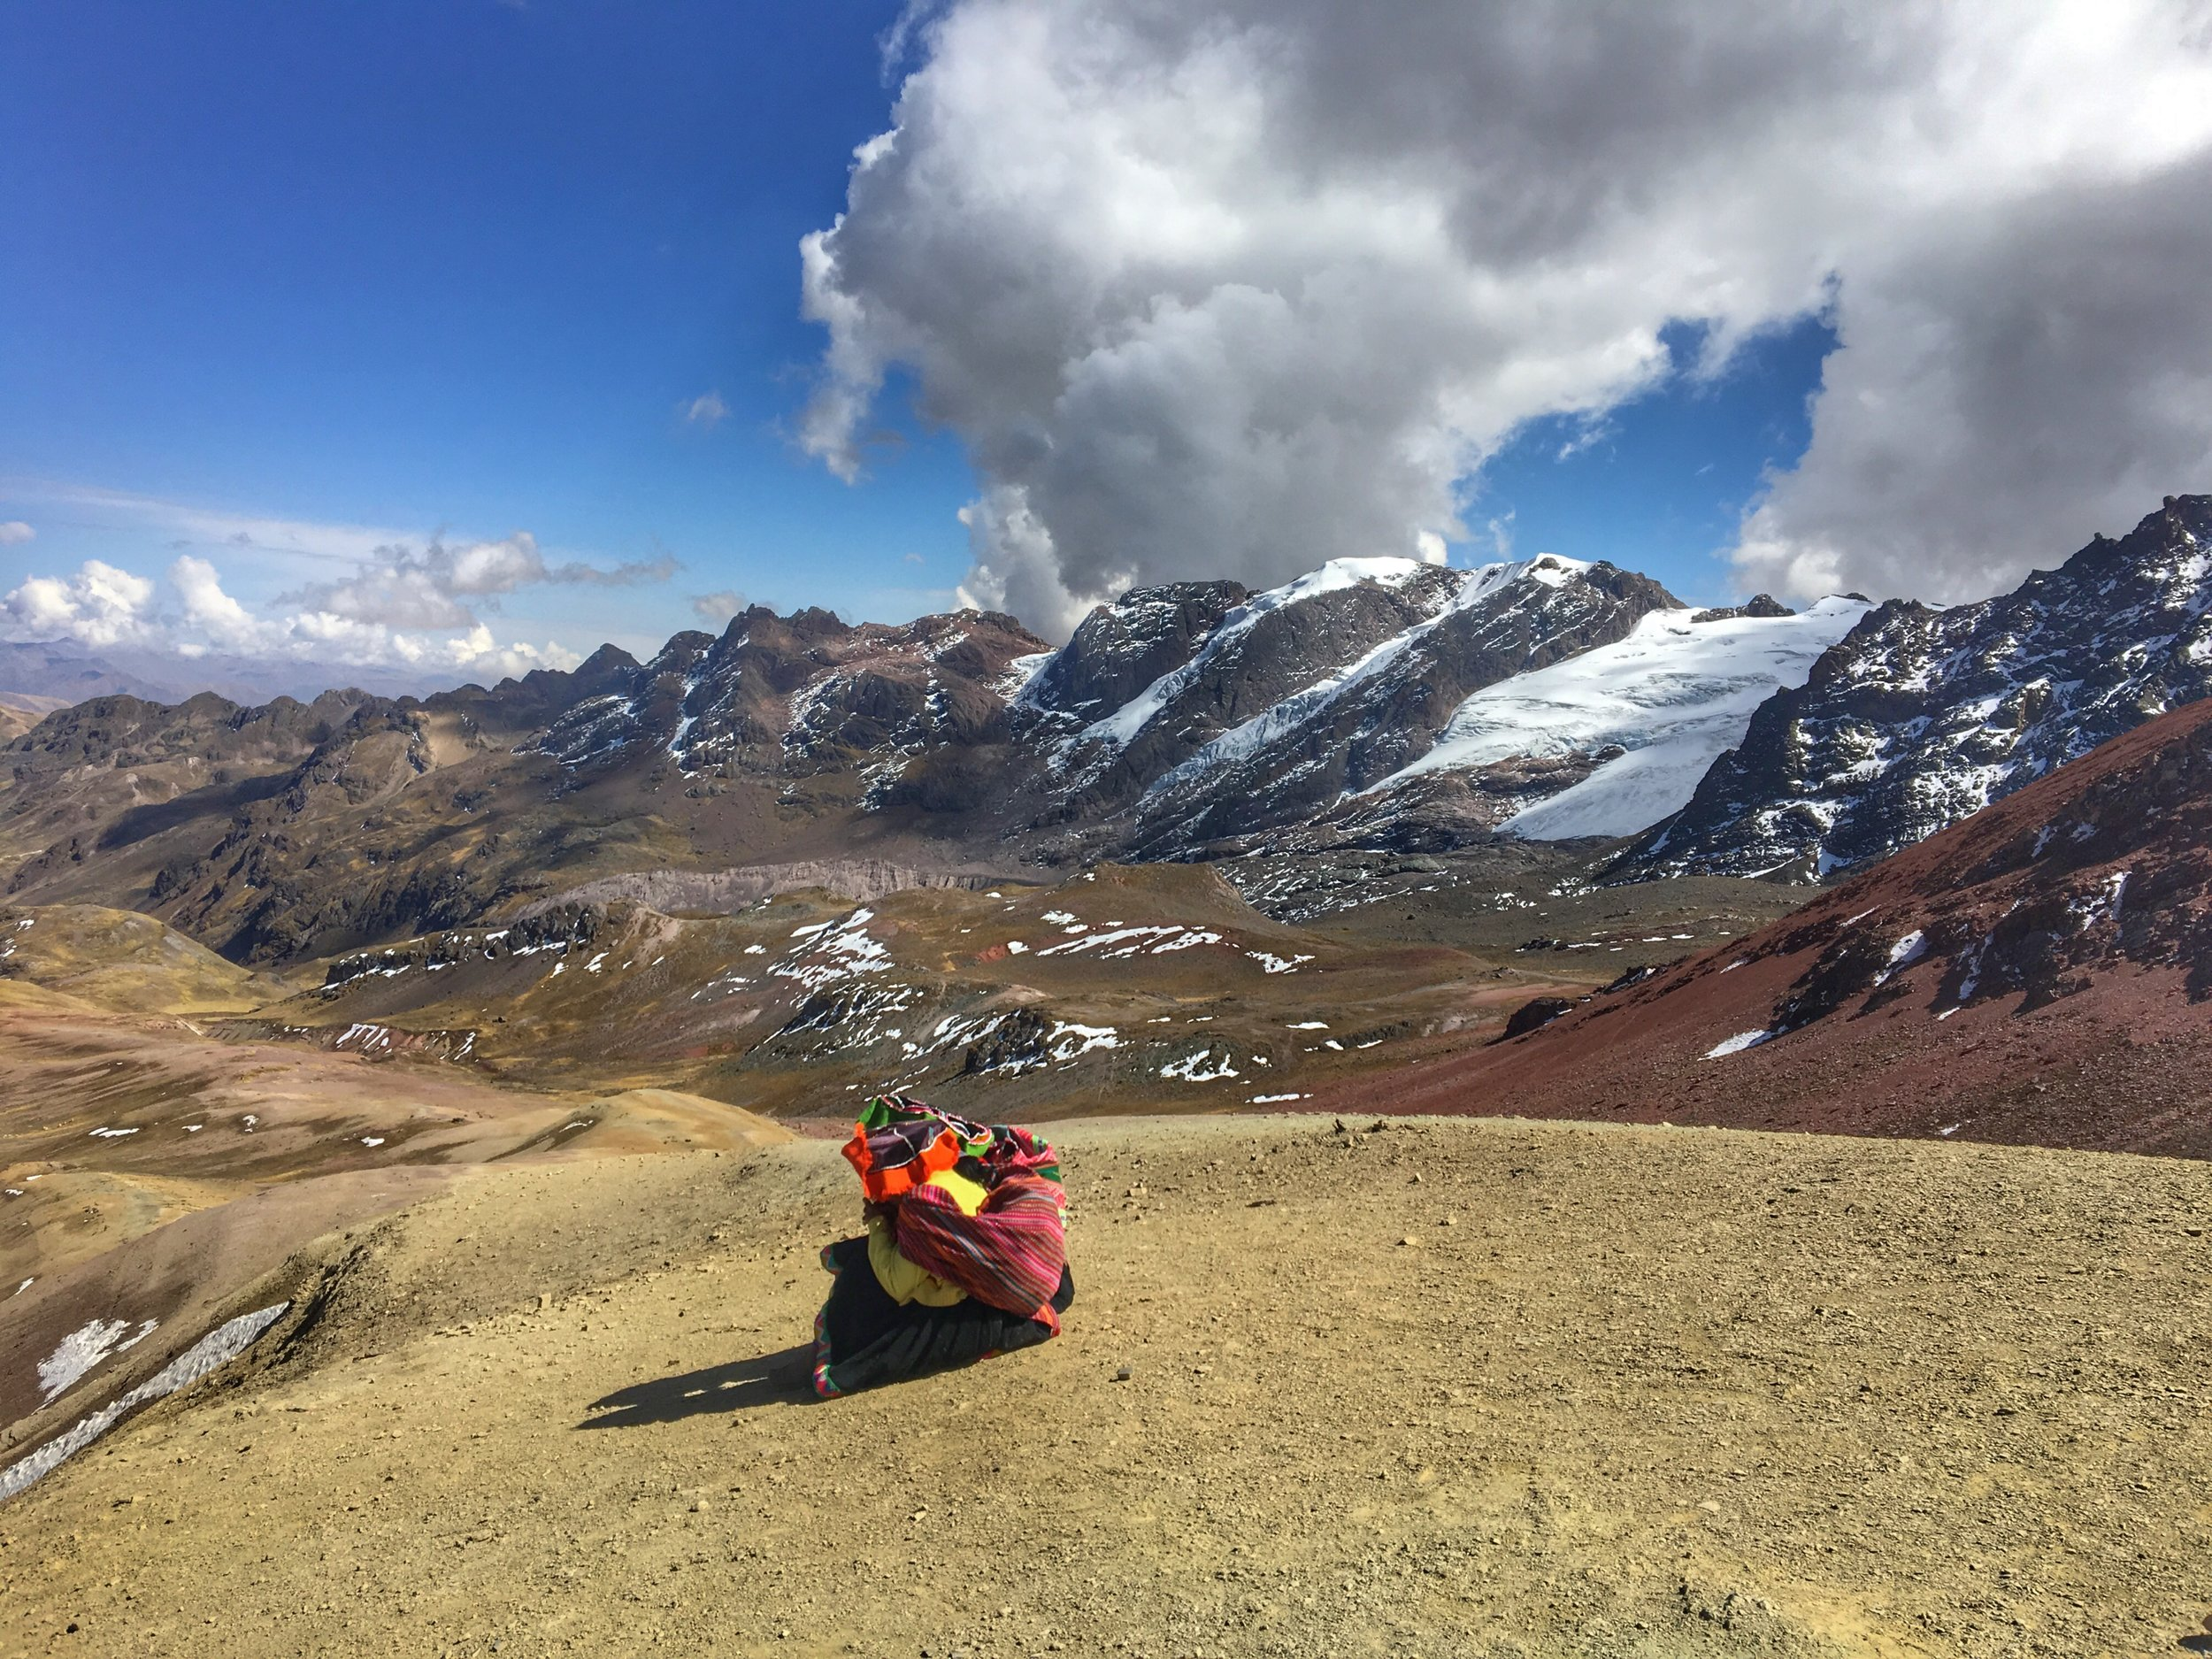 incan-woman-rainbow-mountains-peru.jpg